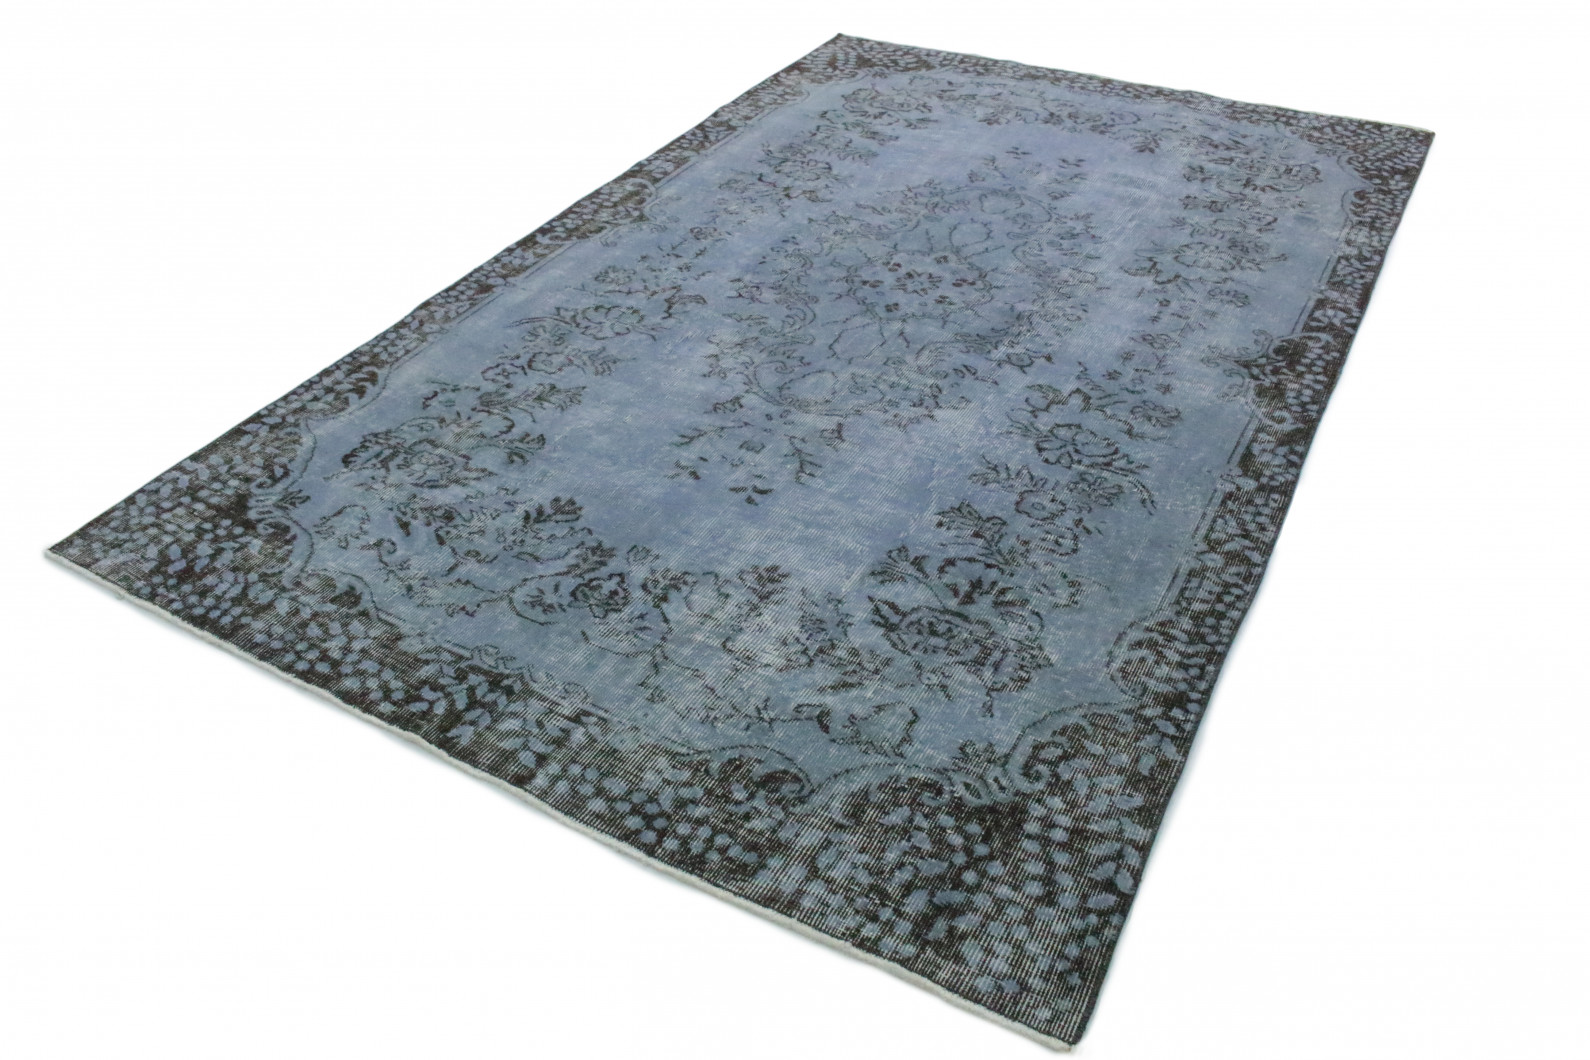 vintage teppich blau grau in 270x170 1011 1138 bei. Black Bedroom Furniture Sets. Home Design Ideas